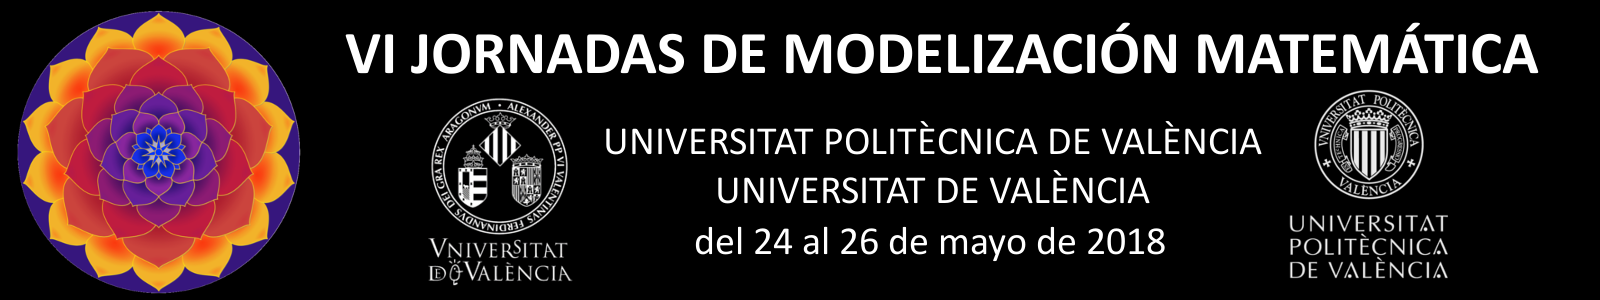 VI Jornadas de Modelización Matemática